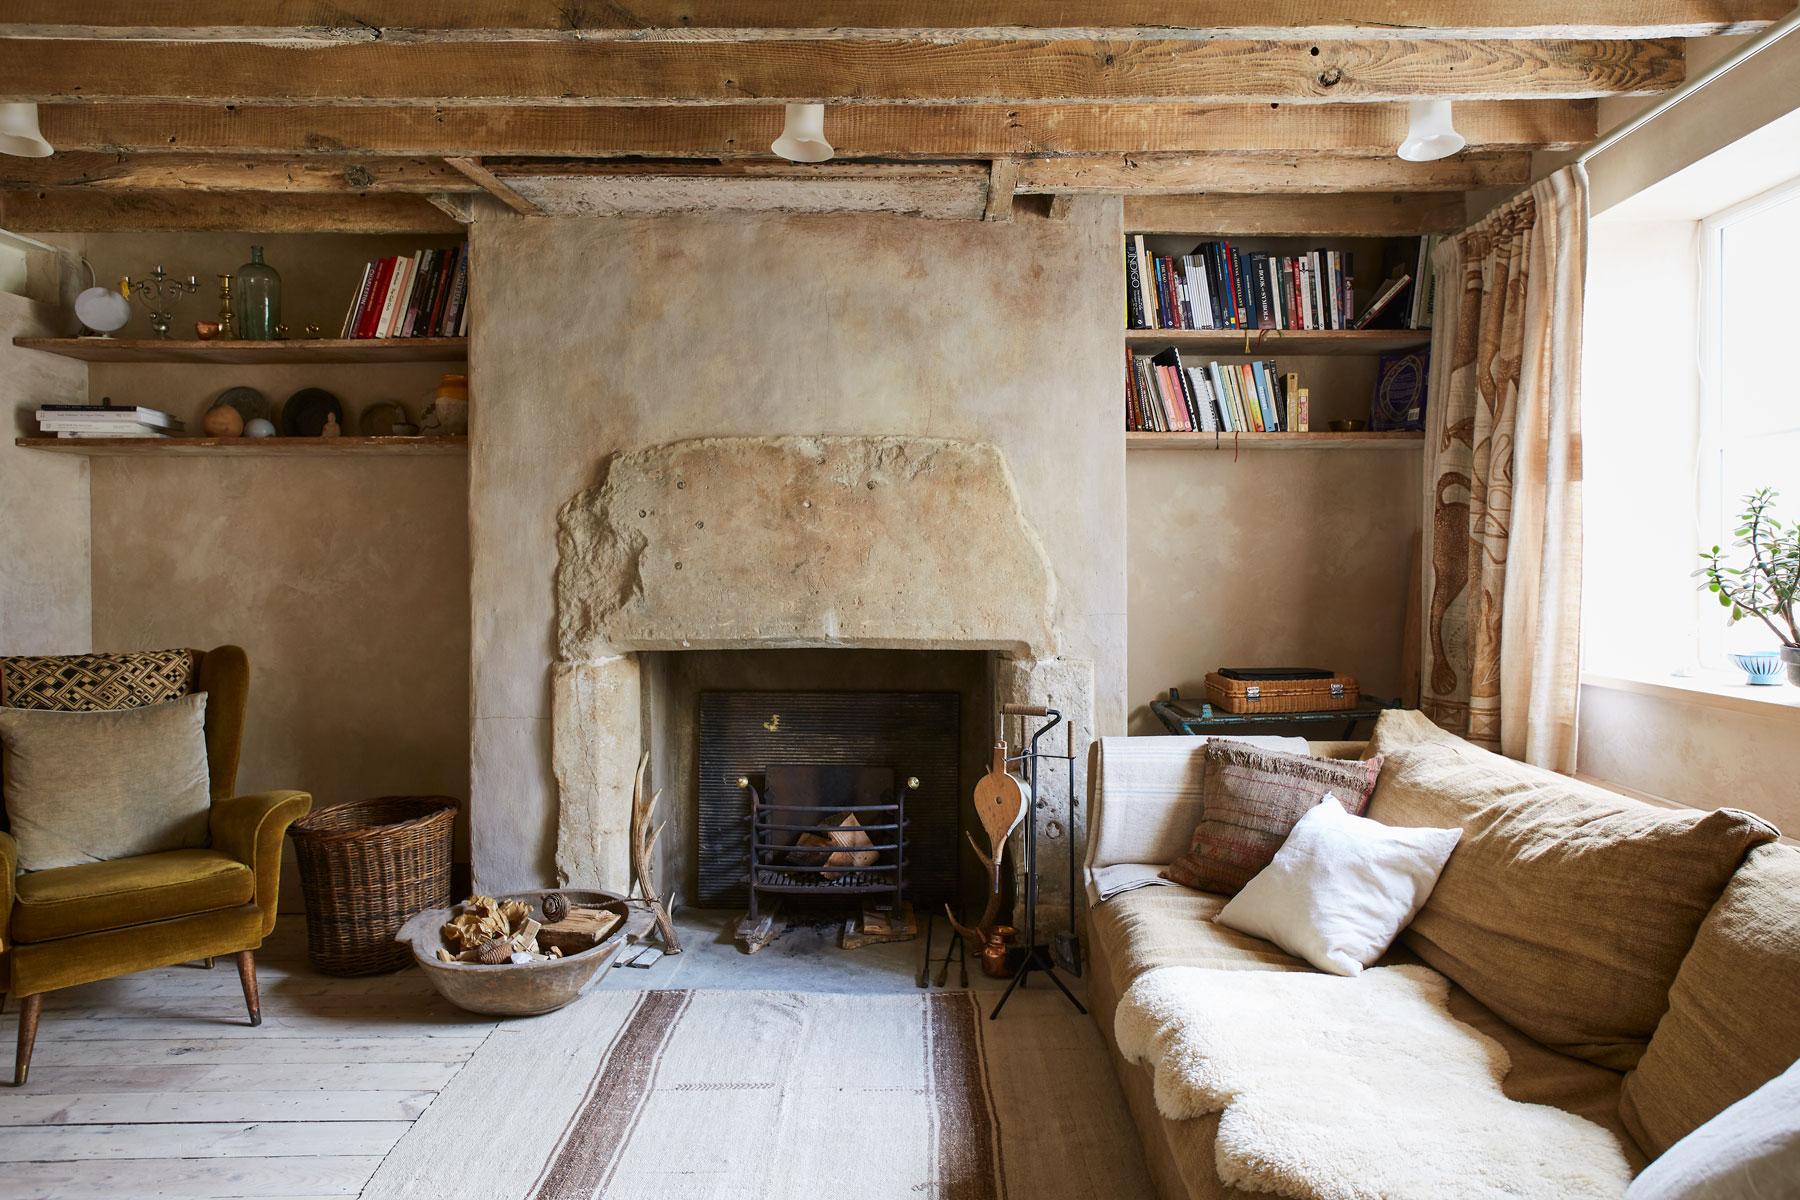 Interior Design Projects - Fall Home Decor Guide